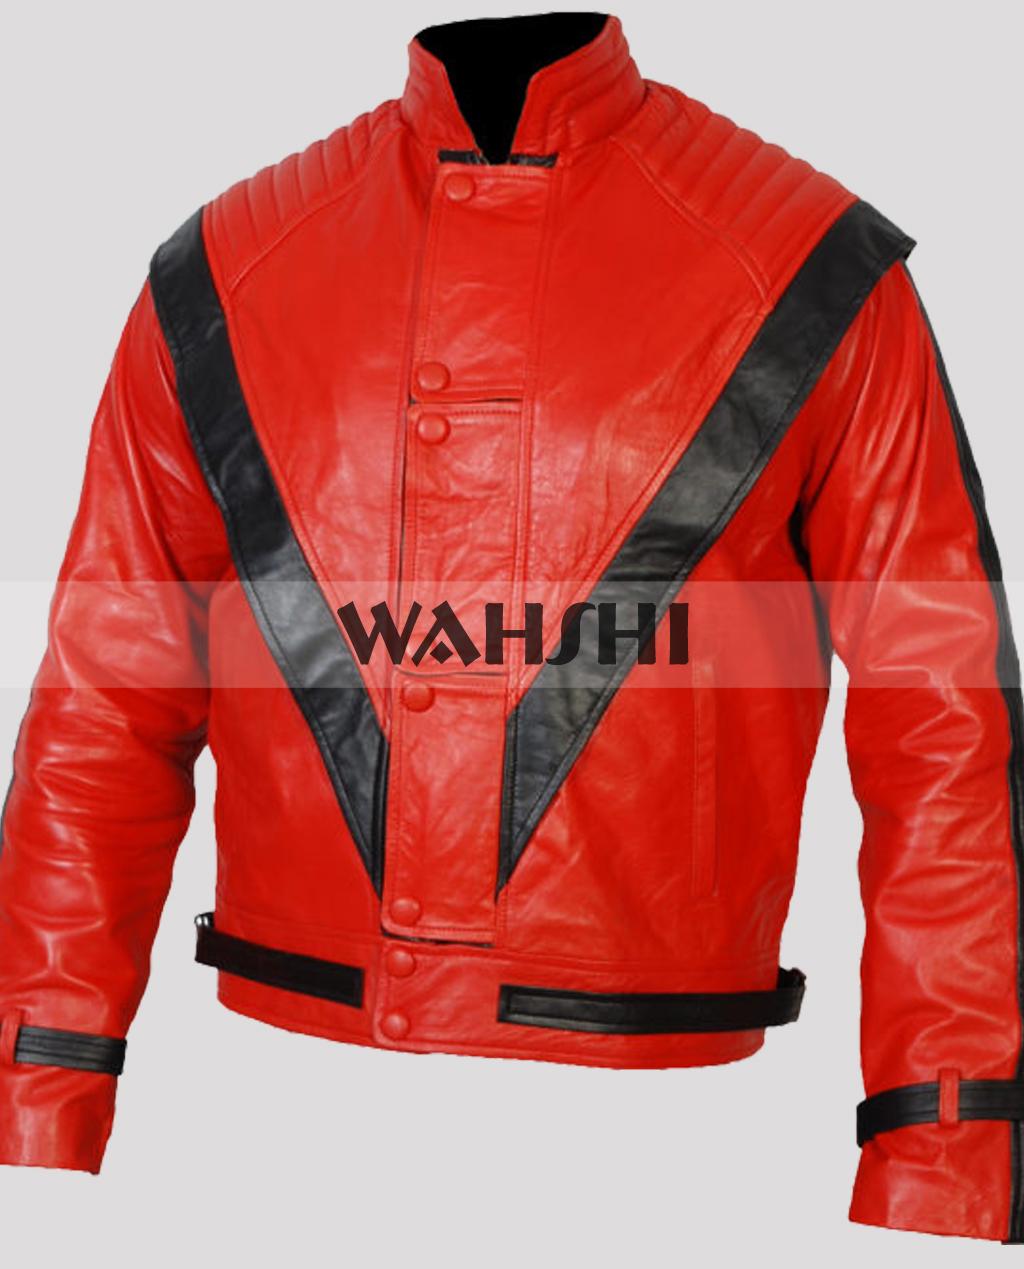 mj-thriller-zipper-jacket